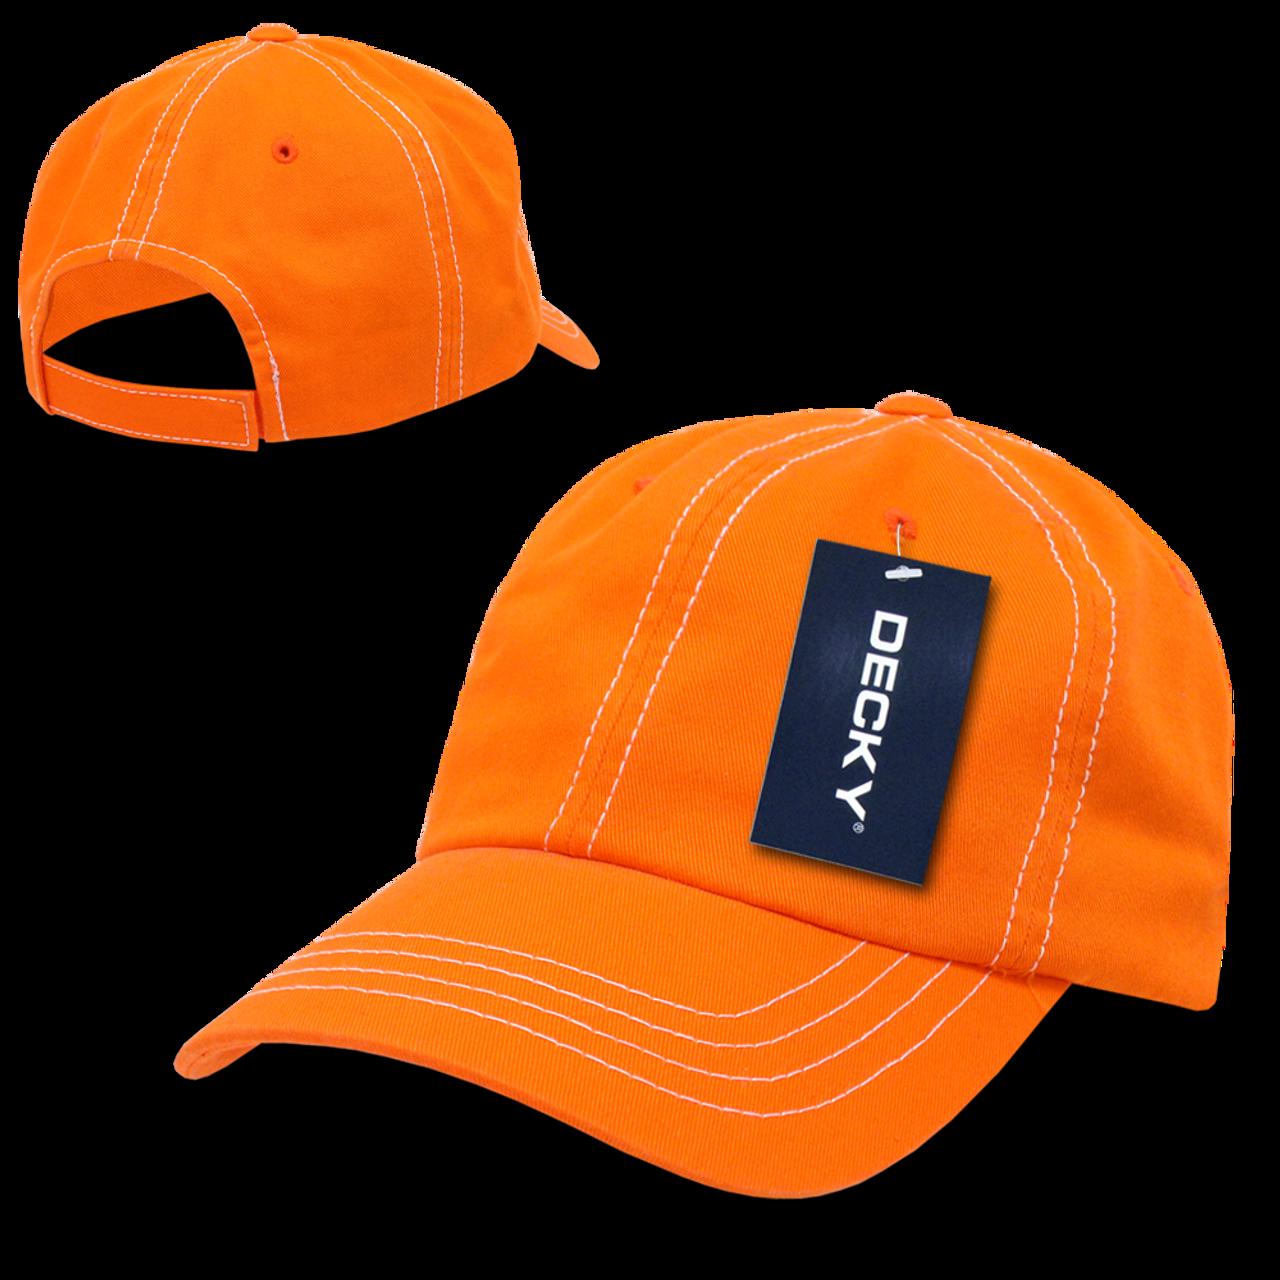 Contra-Stitch Washed Polo Cap - Orange White - USMILITARYHATS.COM b136a6c5b0af